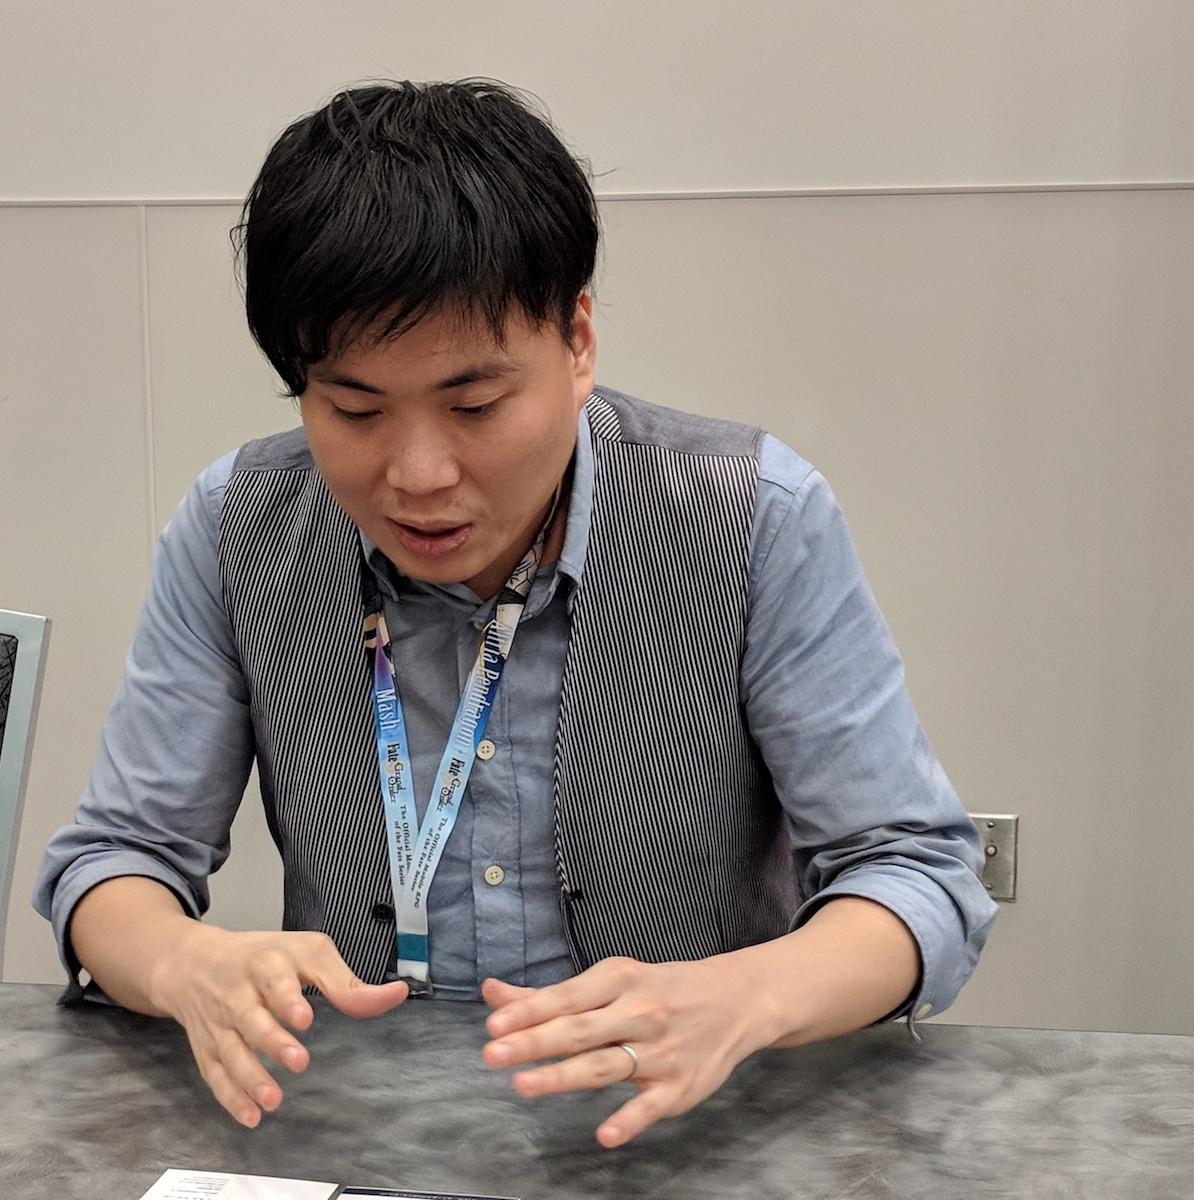 Shingo Yamashita gesturing with his hands while speaking